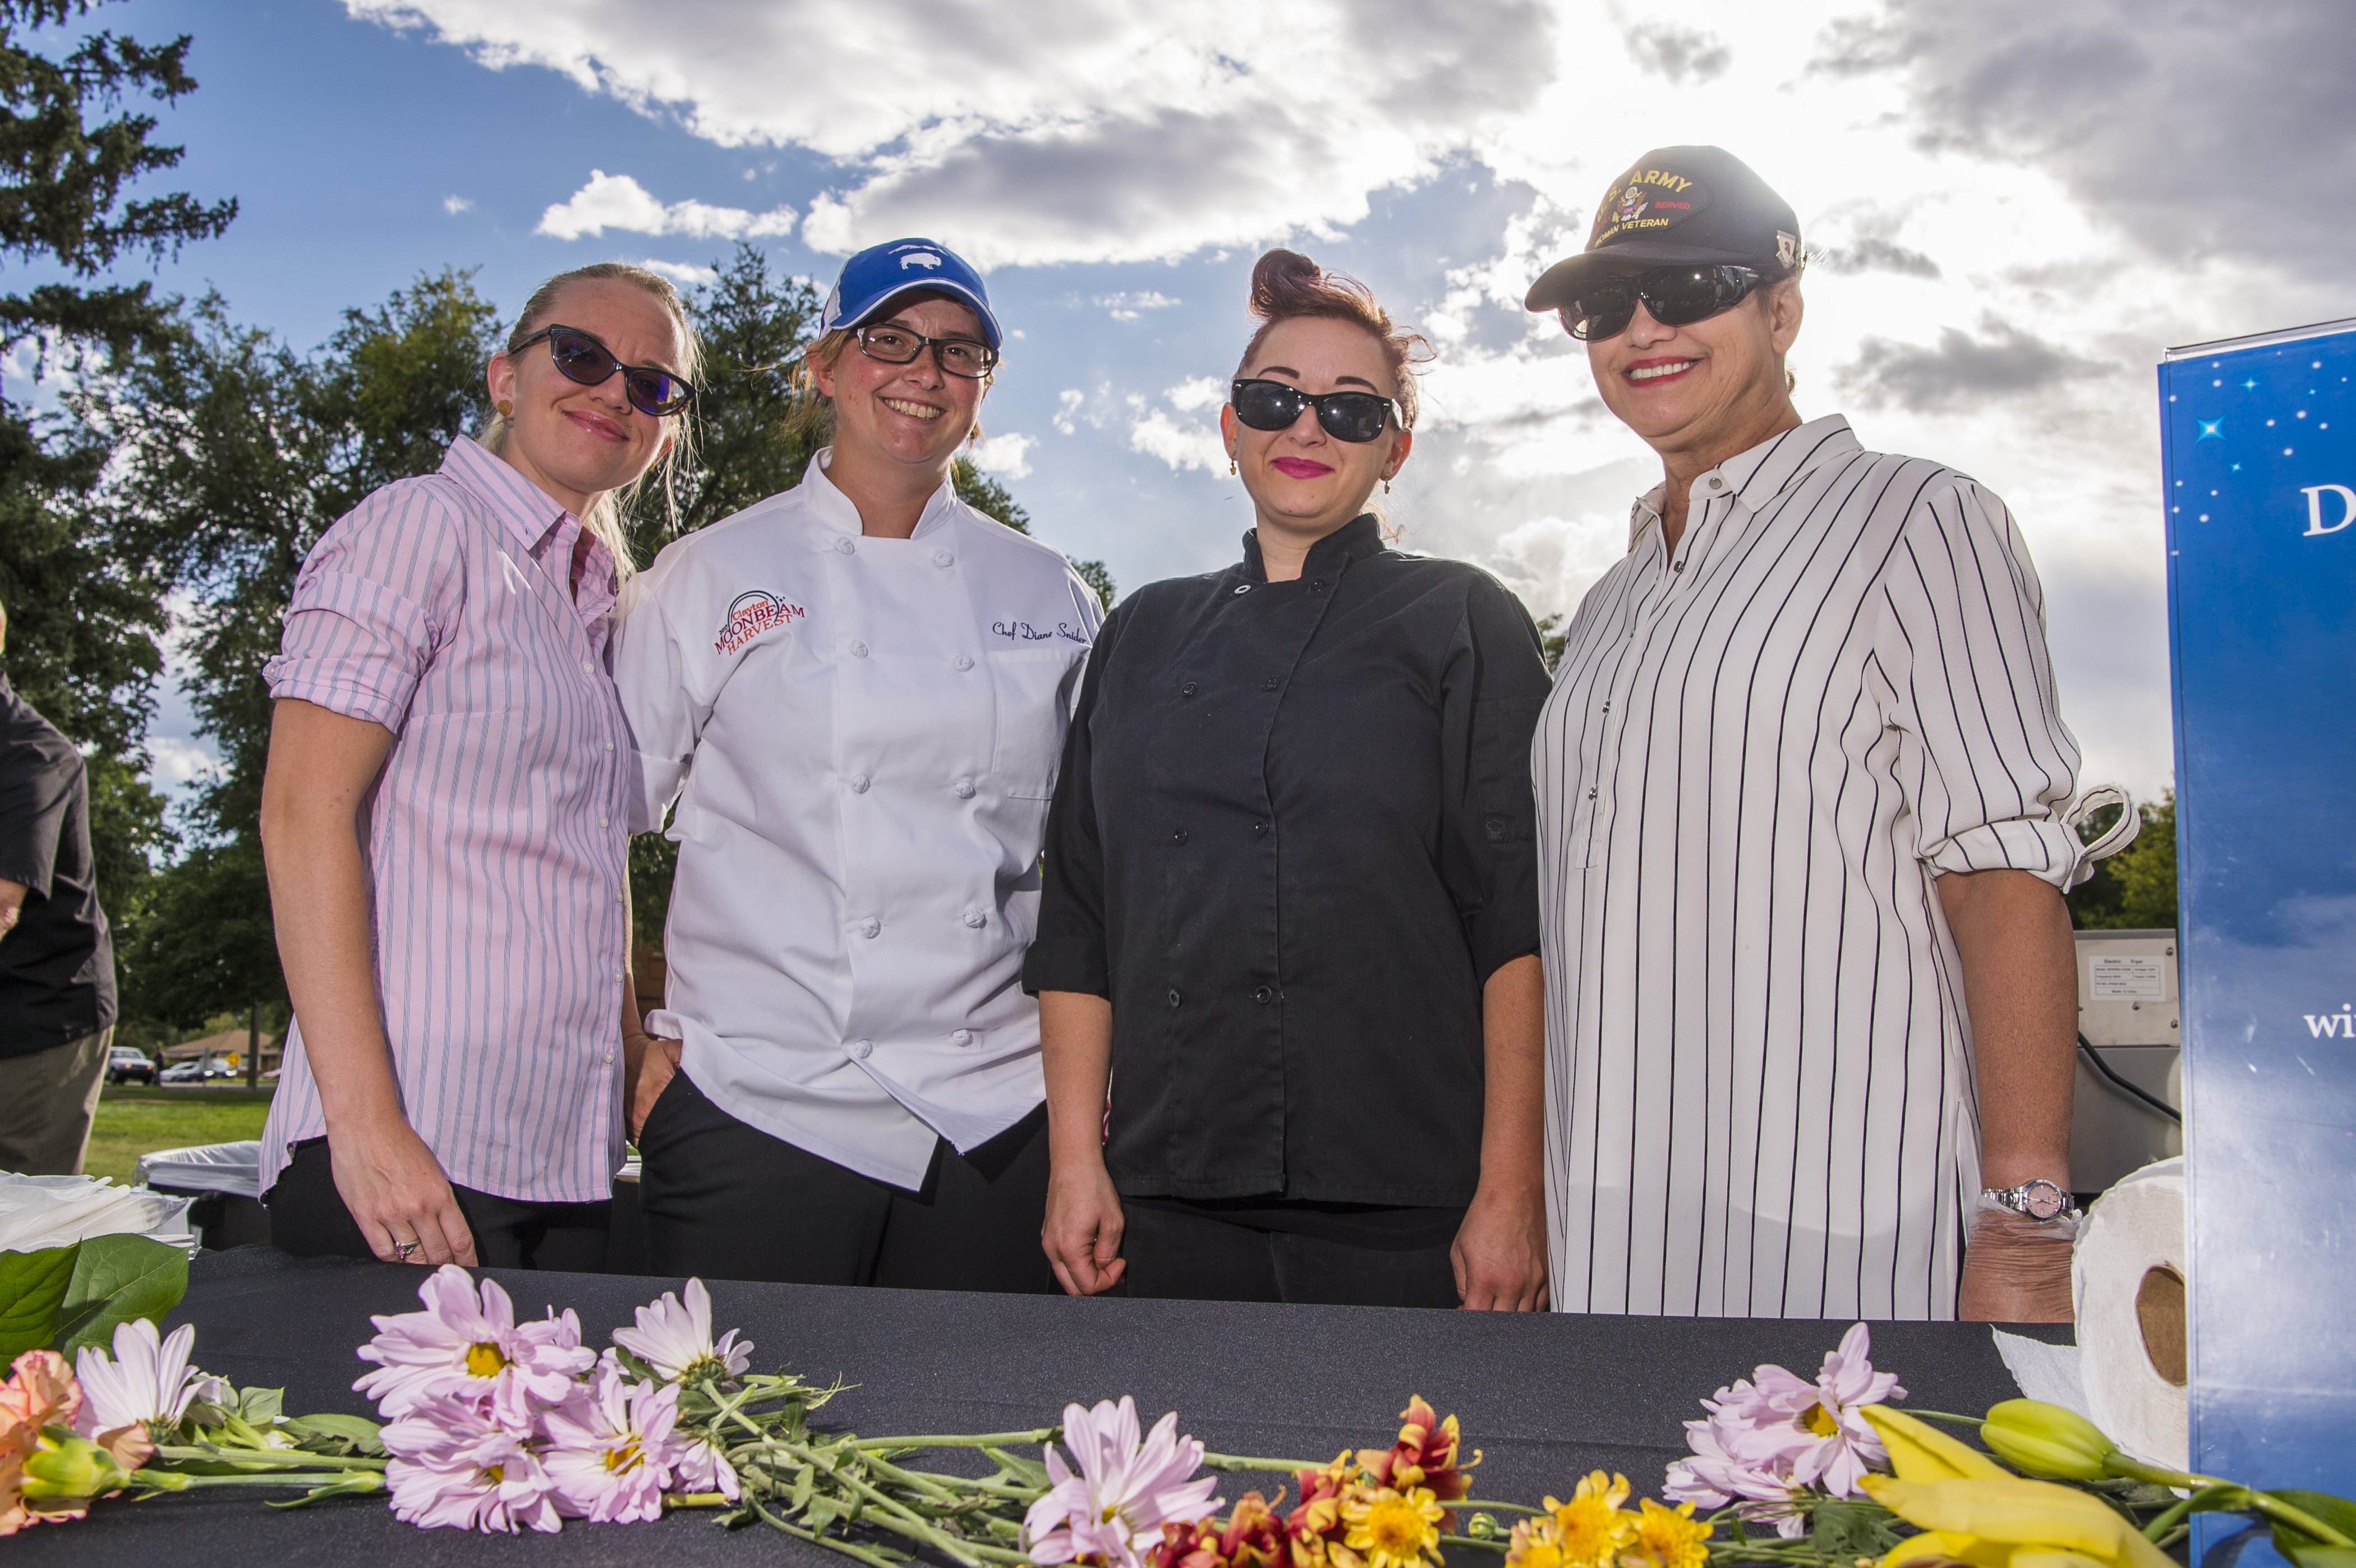 Chef Diane Snider and her team at Moonbeam Harvest 2017